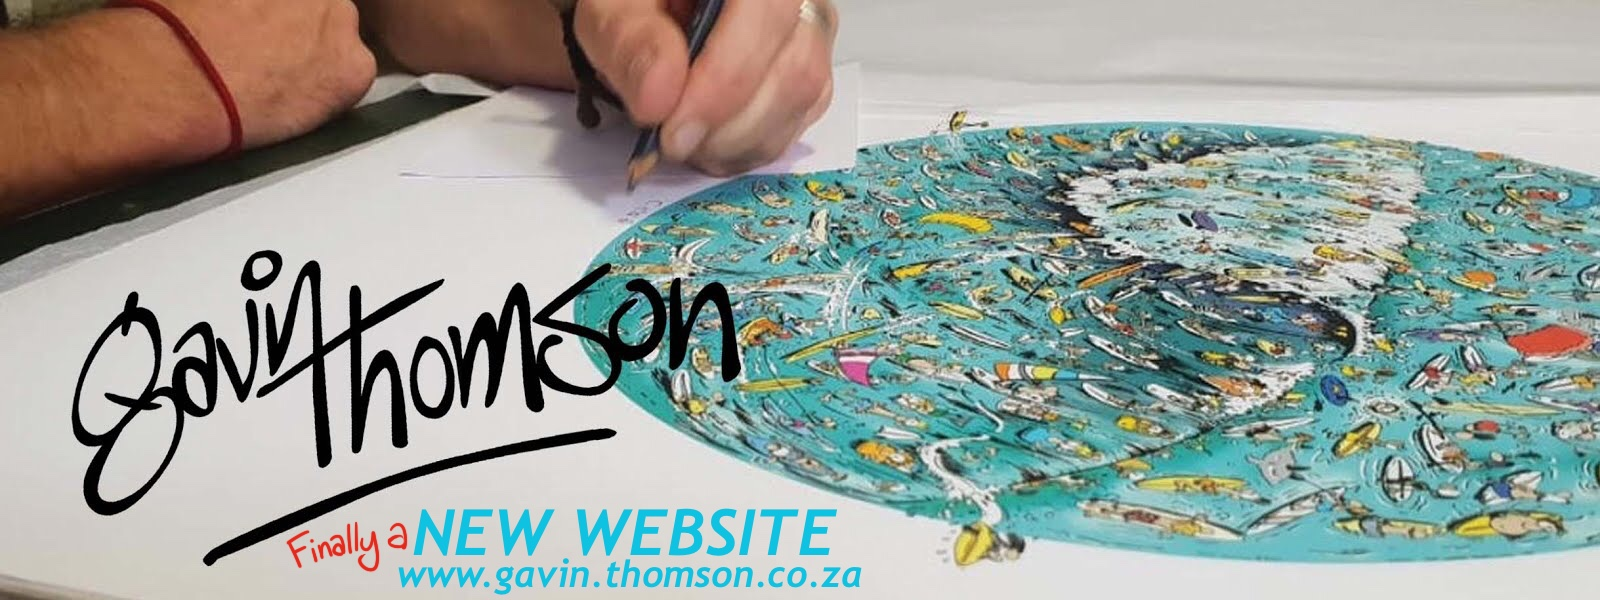 Gavin Thomson